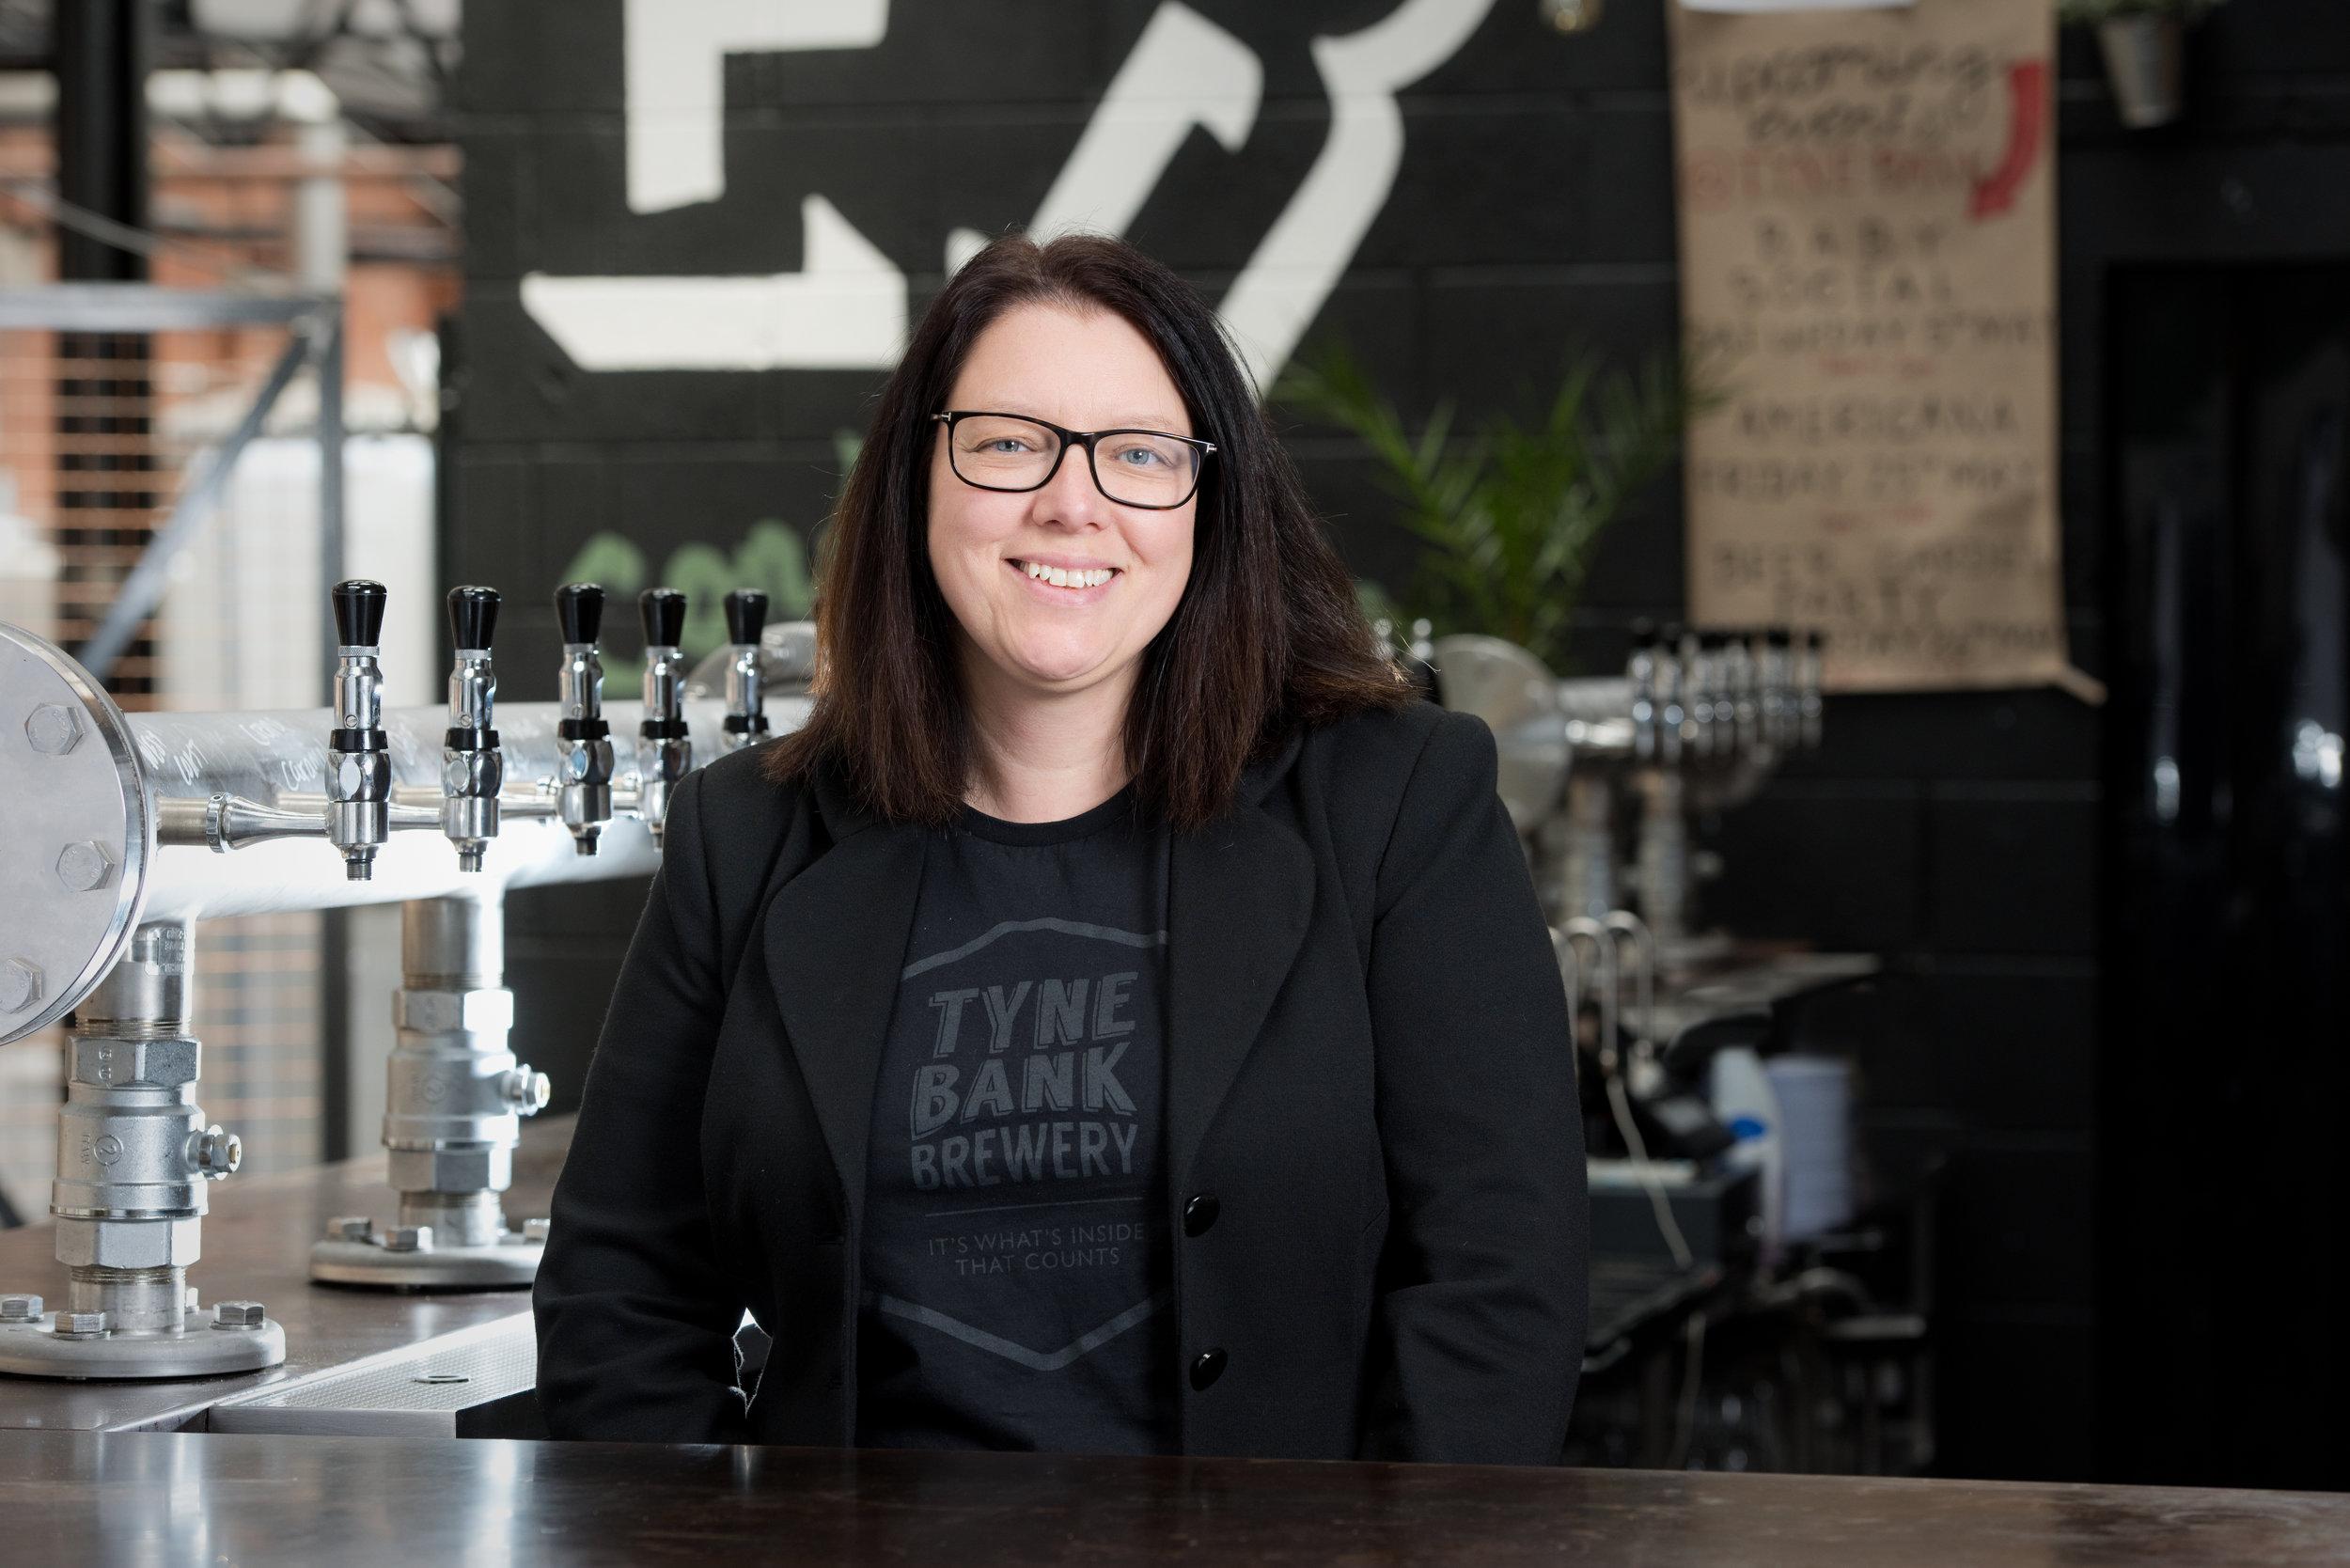 Julia Austin Tyne Bank Brewery & Tap